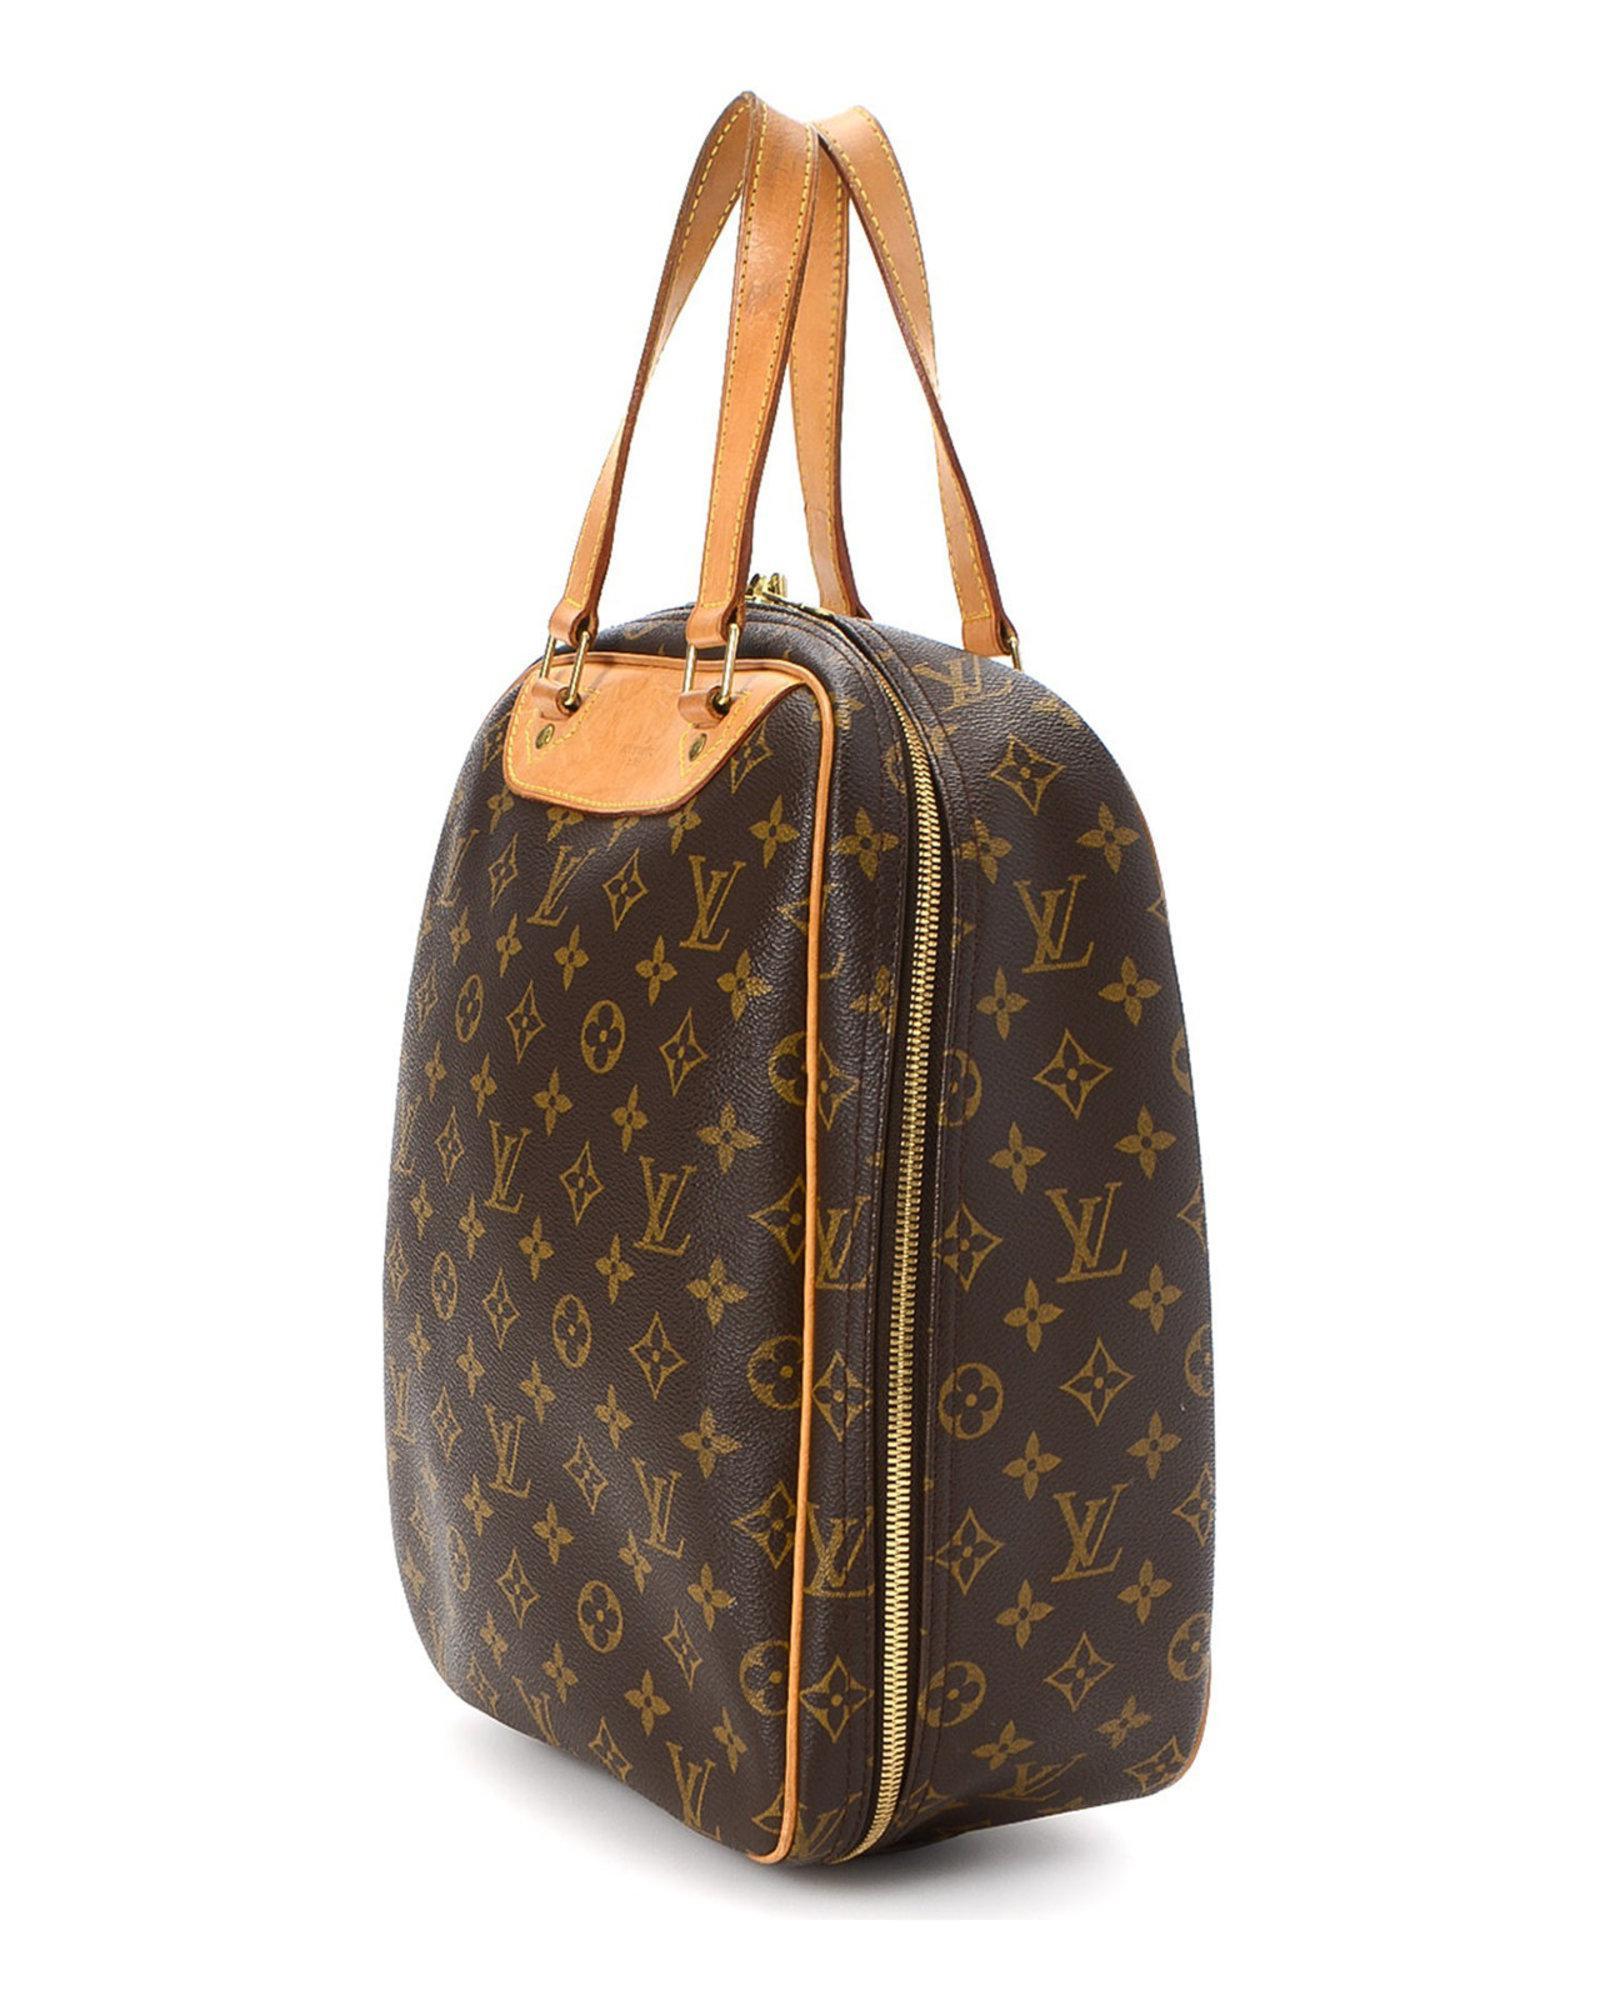 478c02655d69 Lyst - Louis Vuitton Excursion Handbag - Vintage in Brown